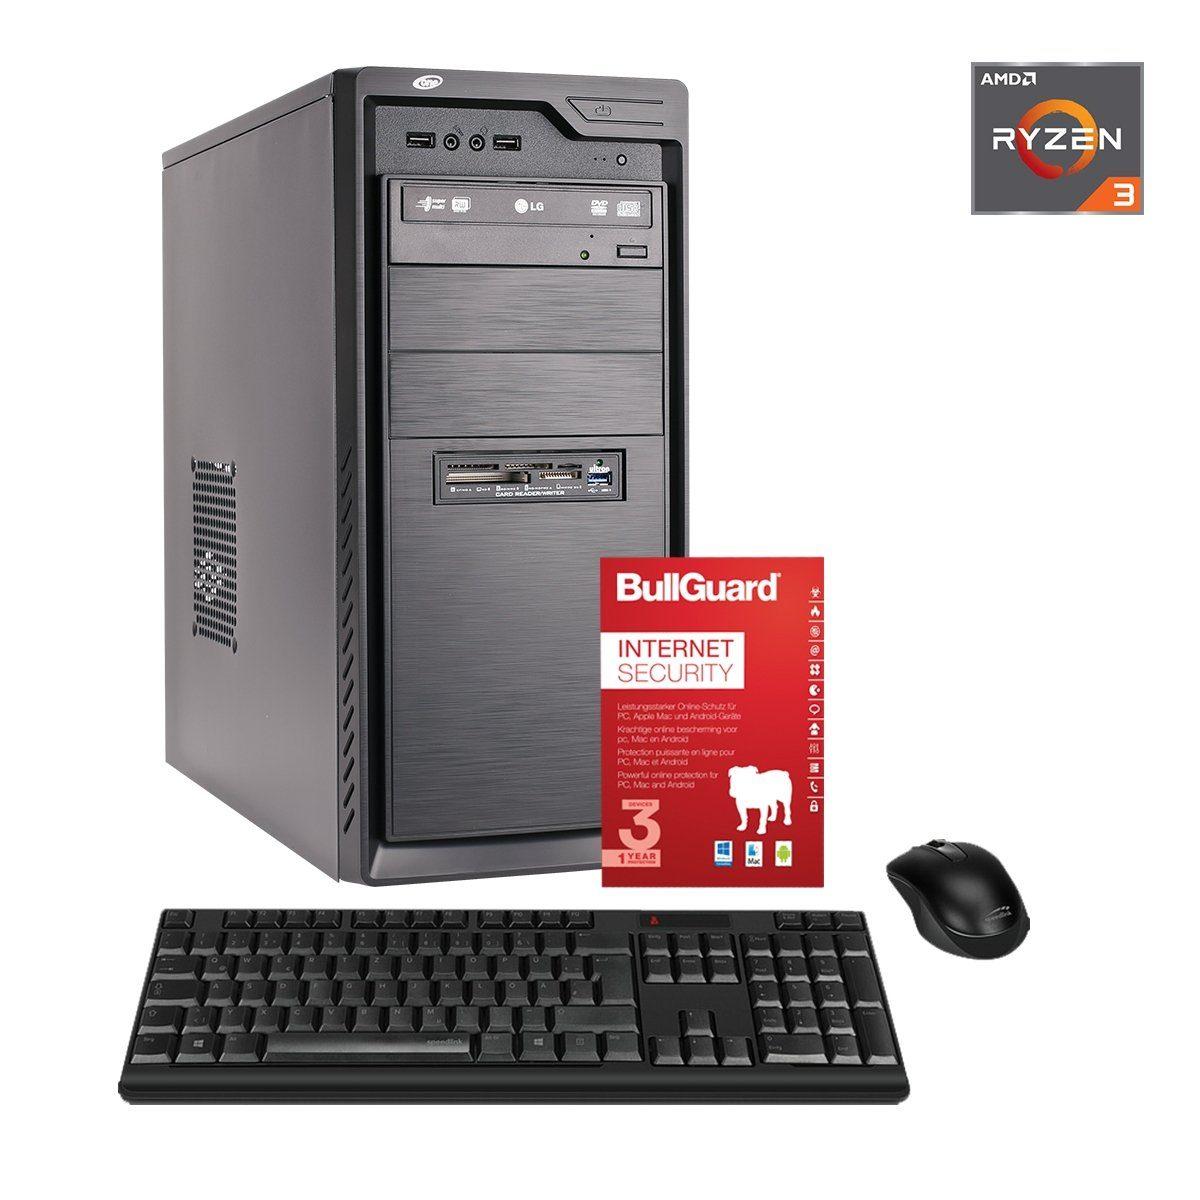 ONE PC, Ryzen 3 2200G, Radeon RX Vega 8 Graphics, 8GB DDR4 RAM »PC 44078«